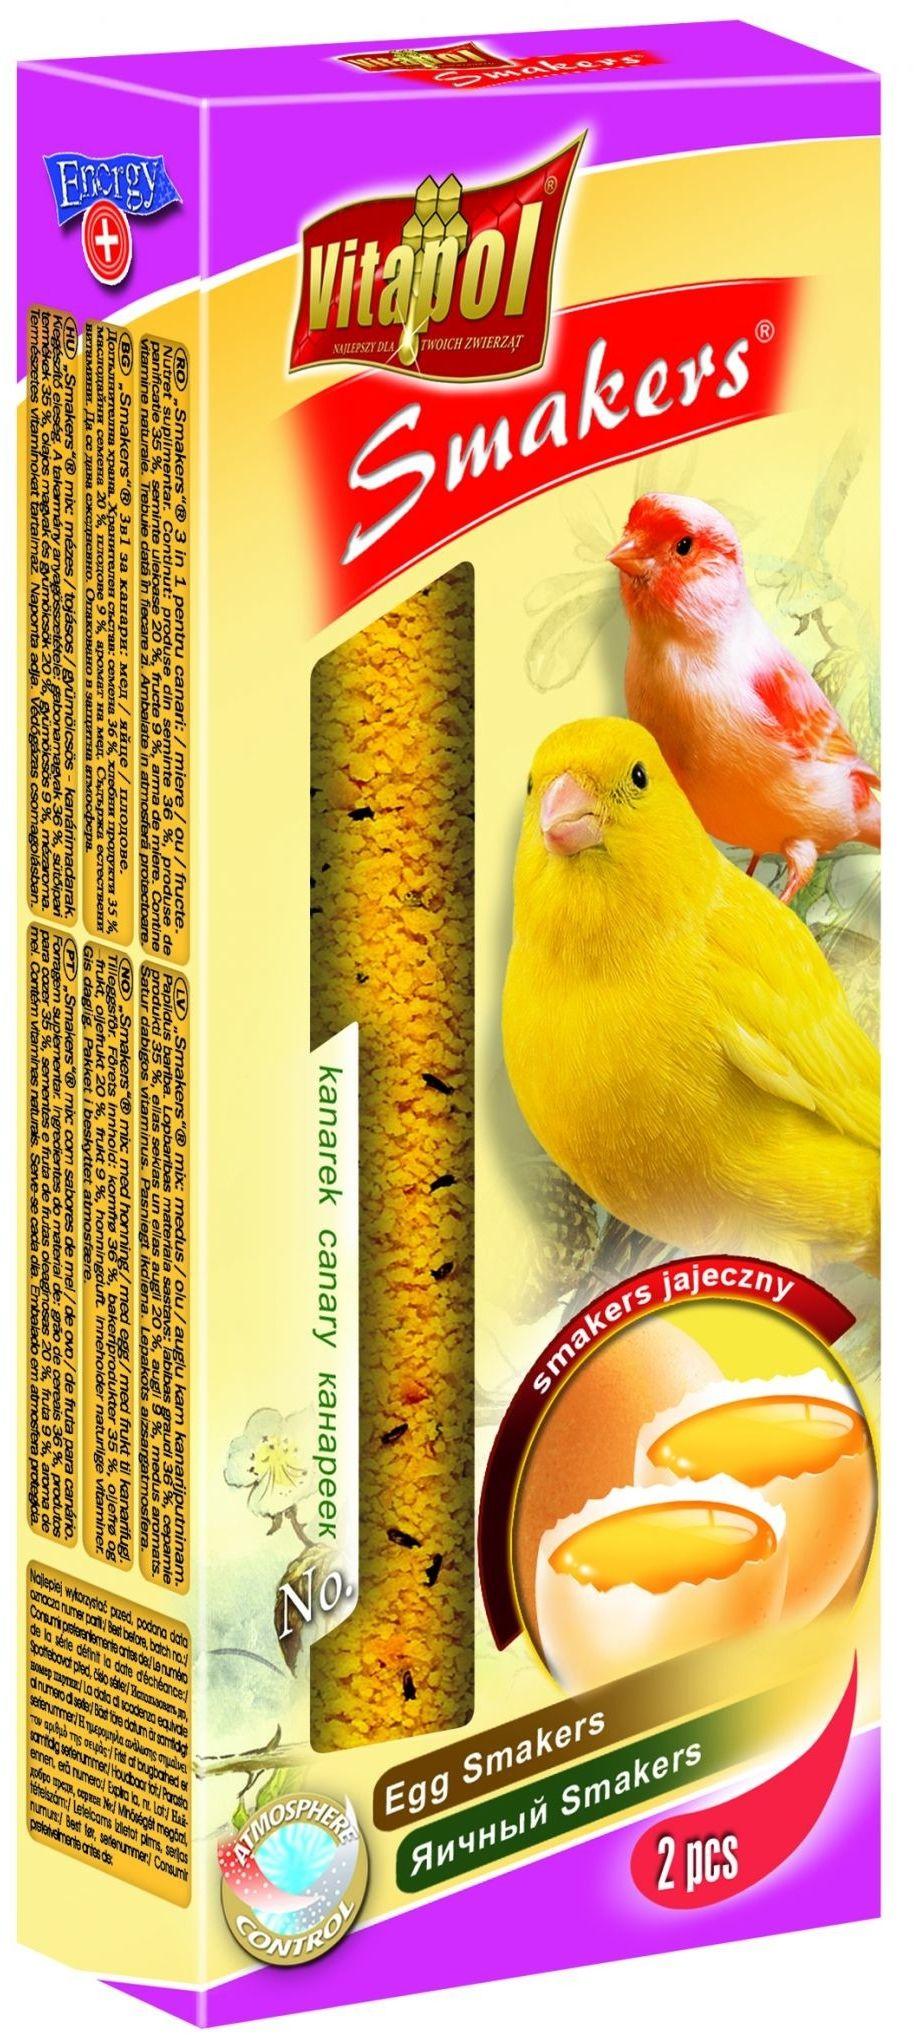 VITAPOL - Kolby dla kanarka jajeczne